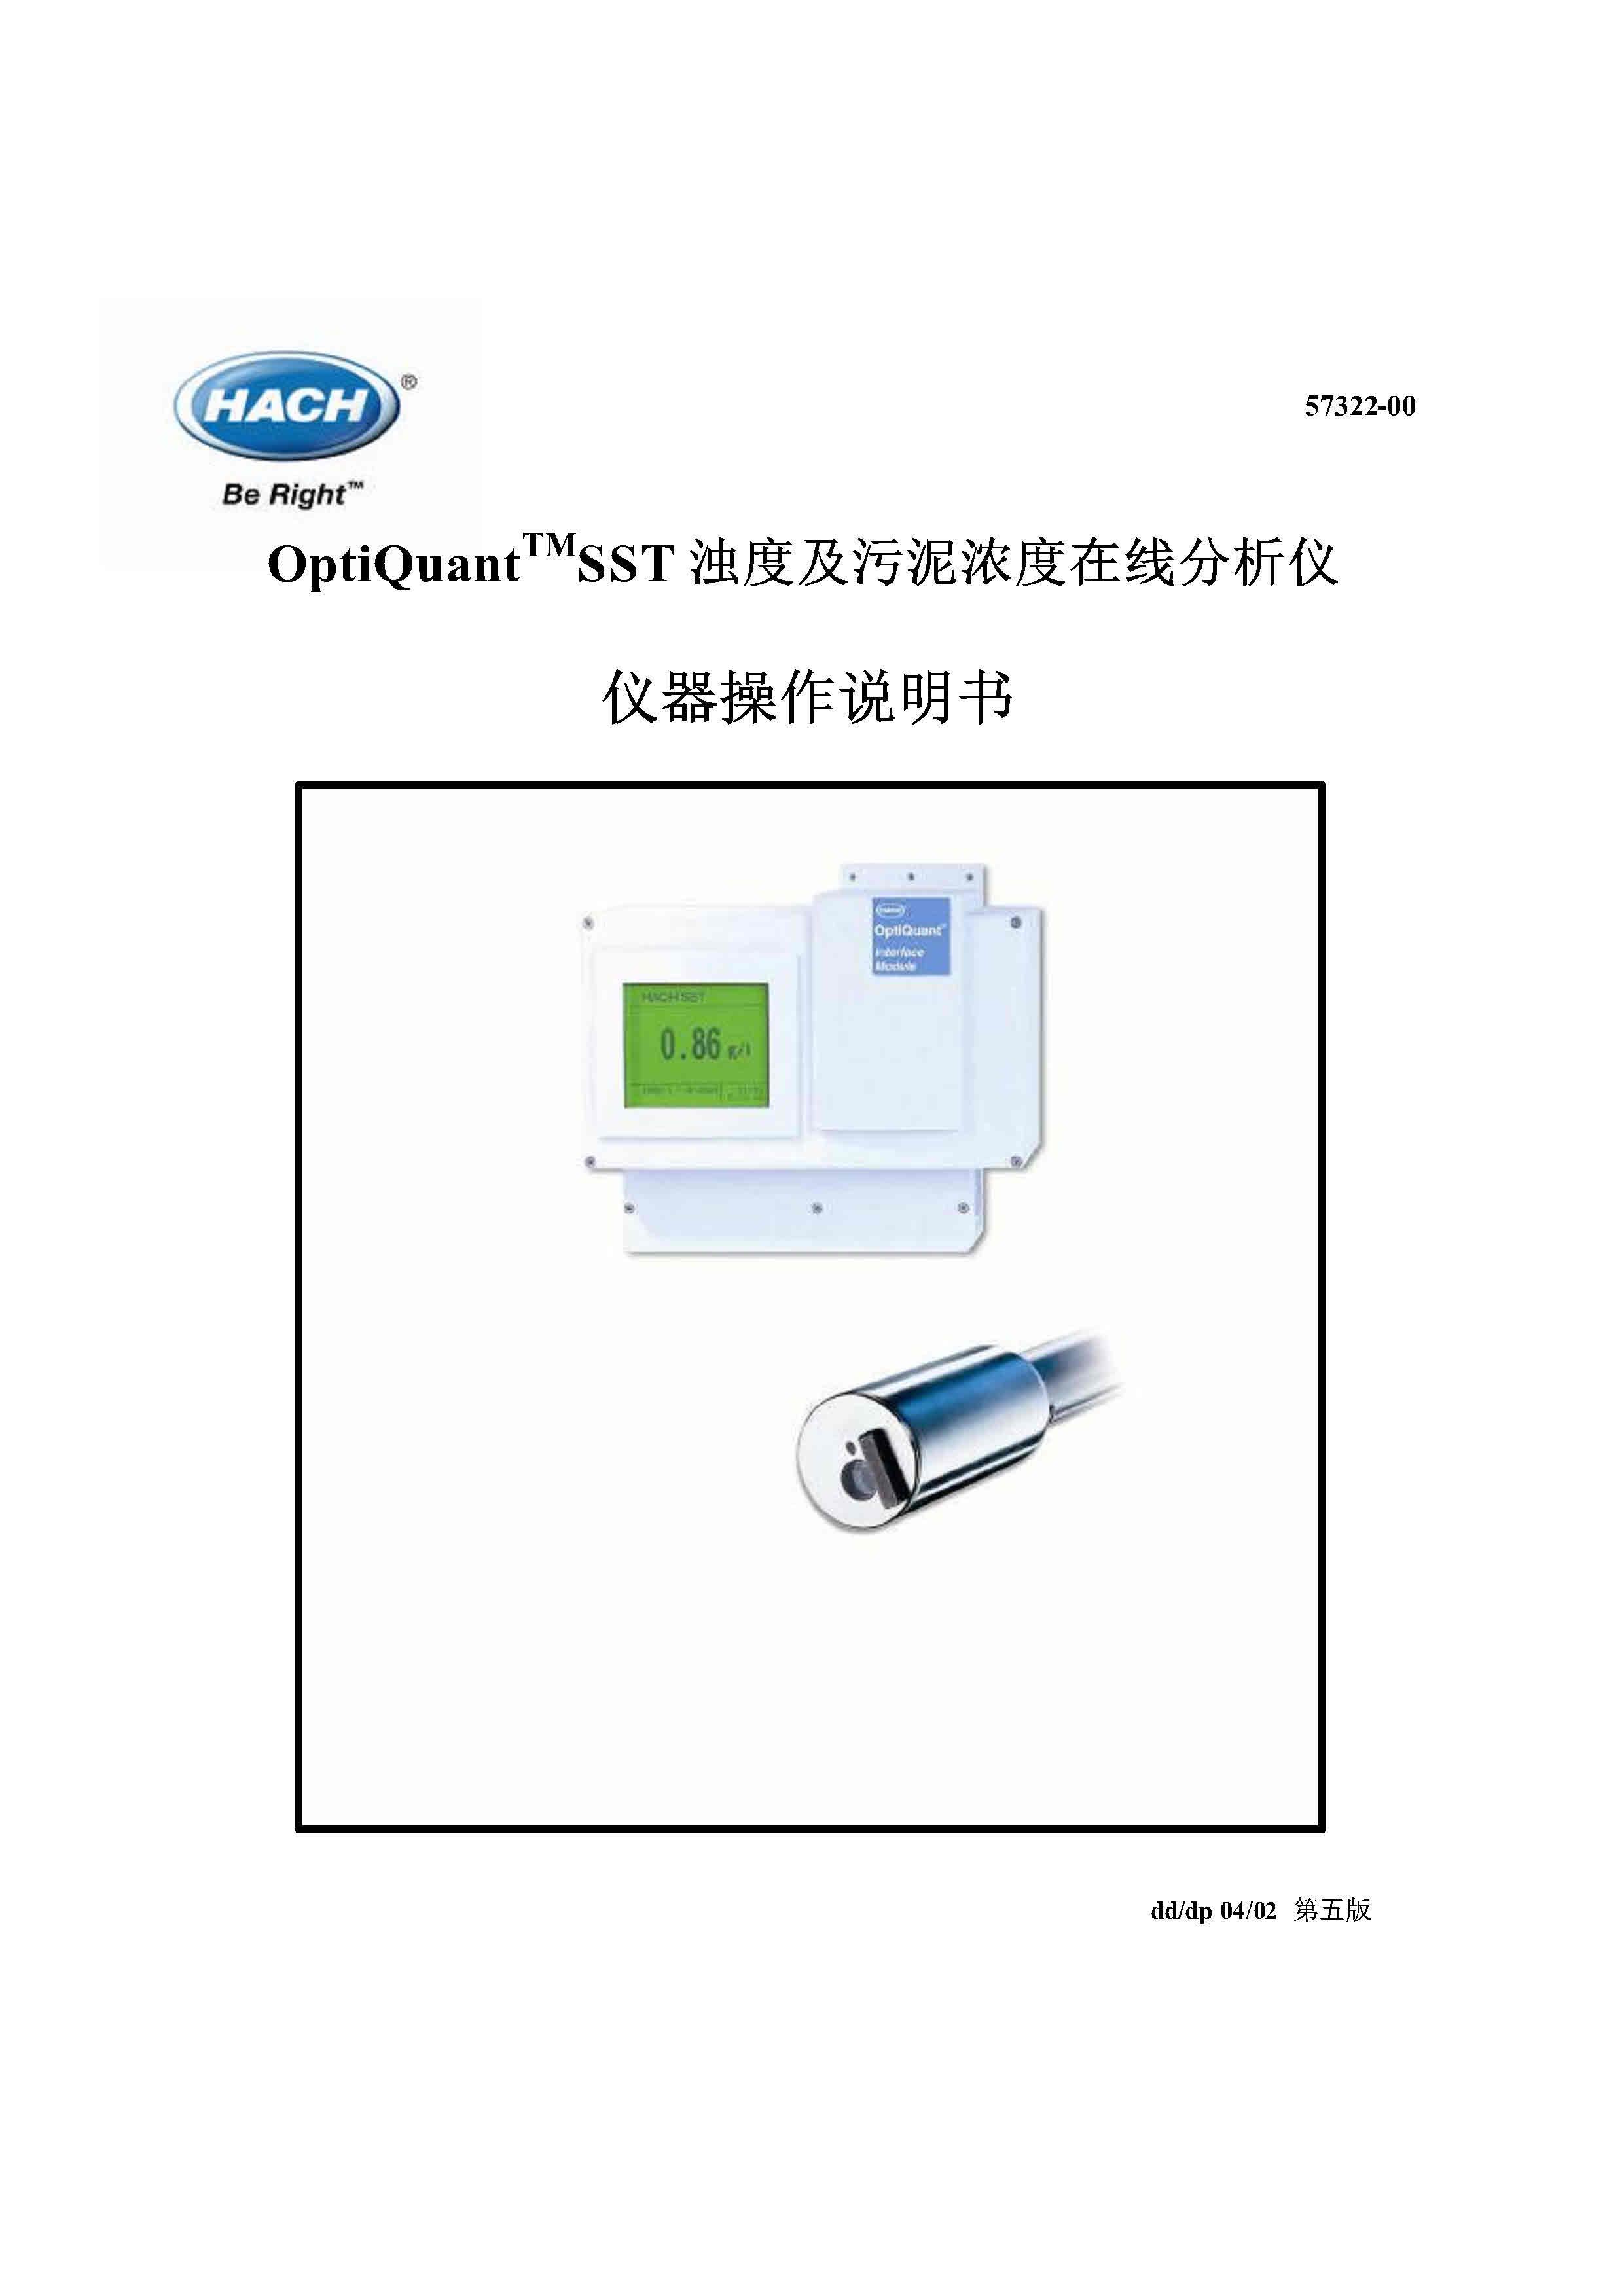 HACH OptiQuant悬浮固体及浊度分析仪操作手册